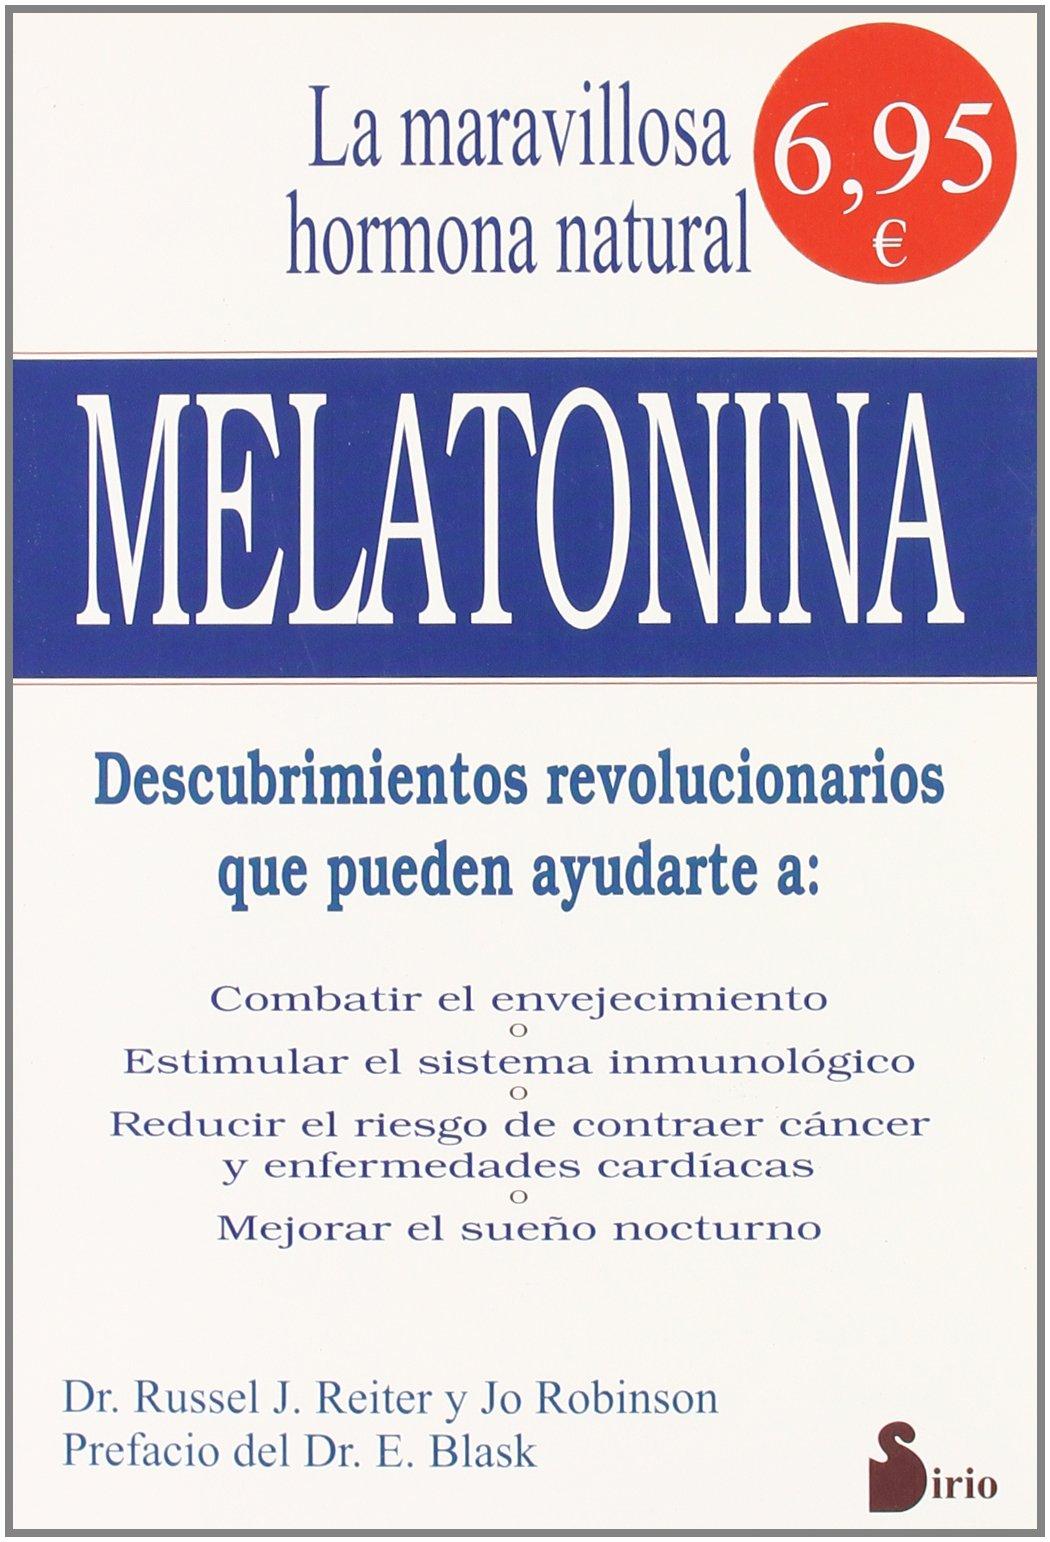 La maravillosa hormona natural de nuestro cuerpo.Melatonina: Russel J. Reiter, Dr Russel J. Reiter: 9788478081882: Amazon.com: Books